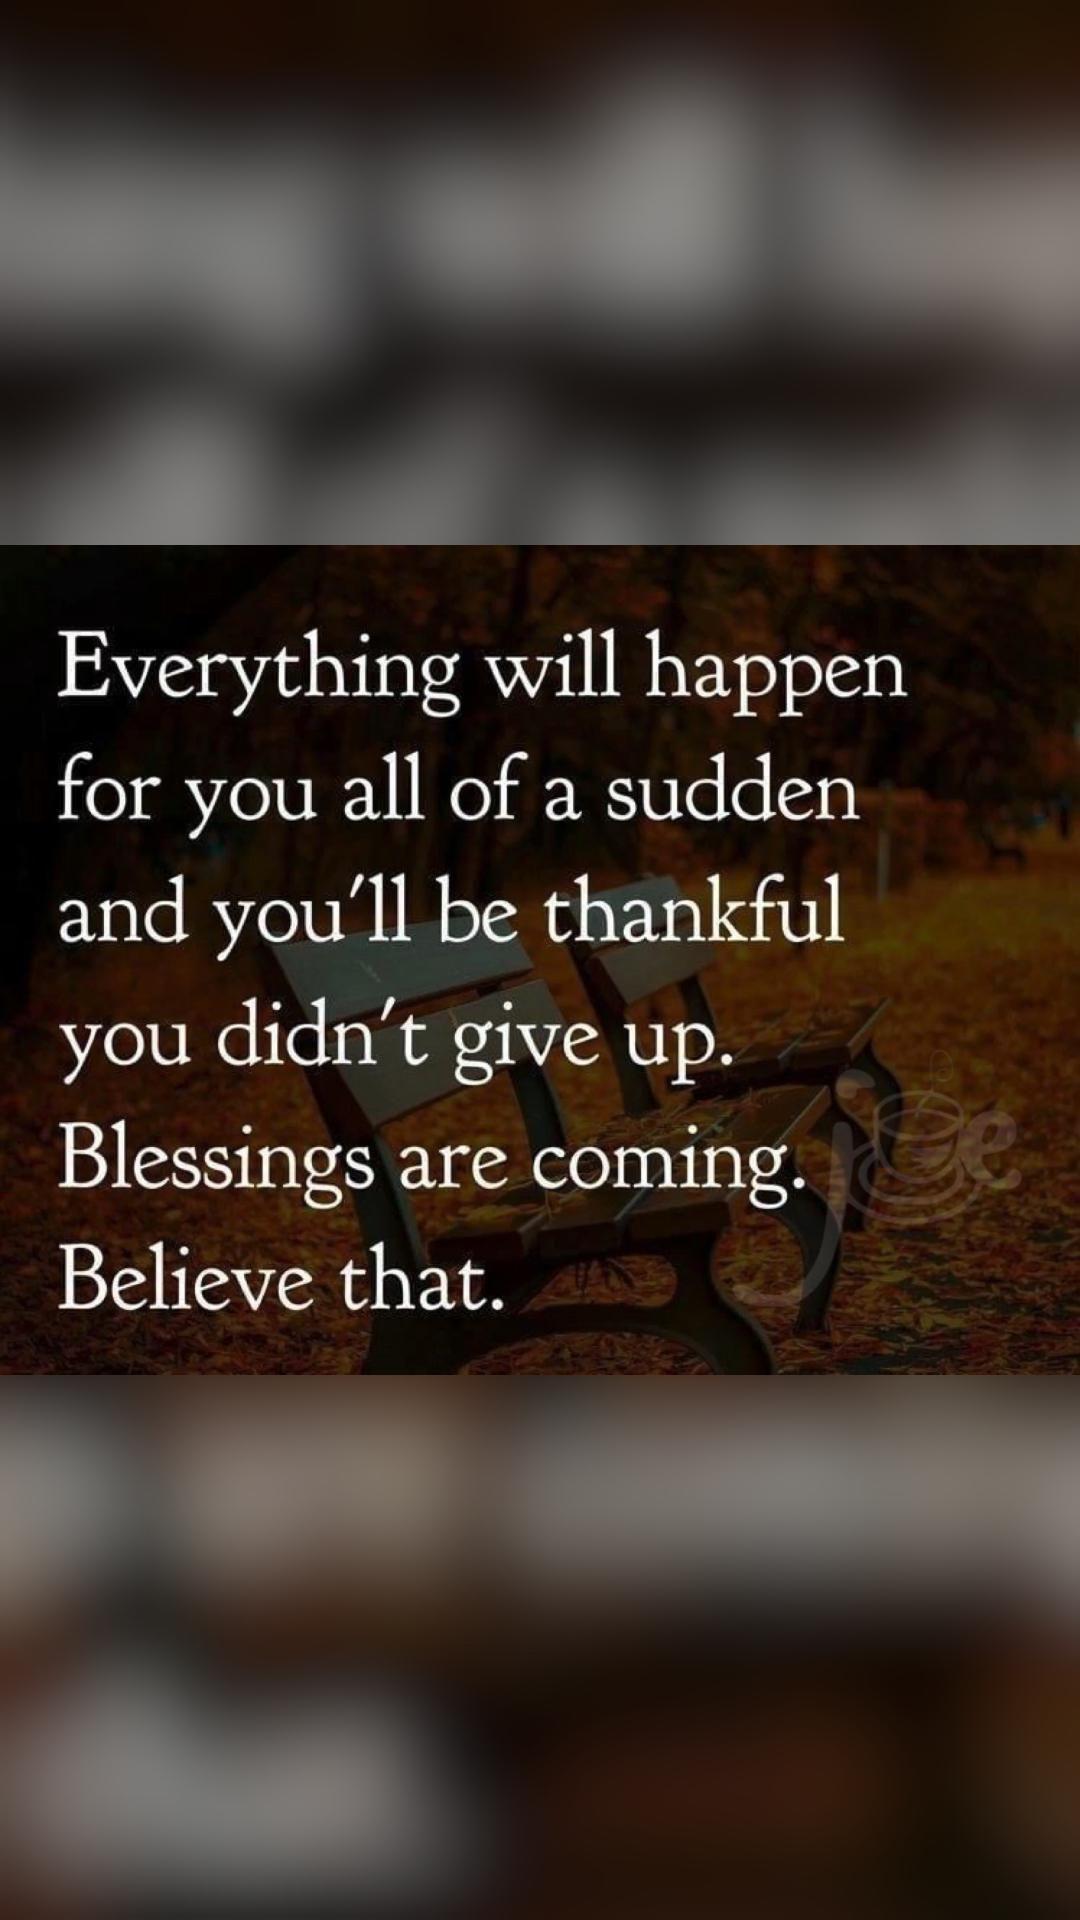 Blessings, Joy & Refreshing